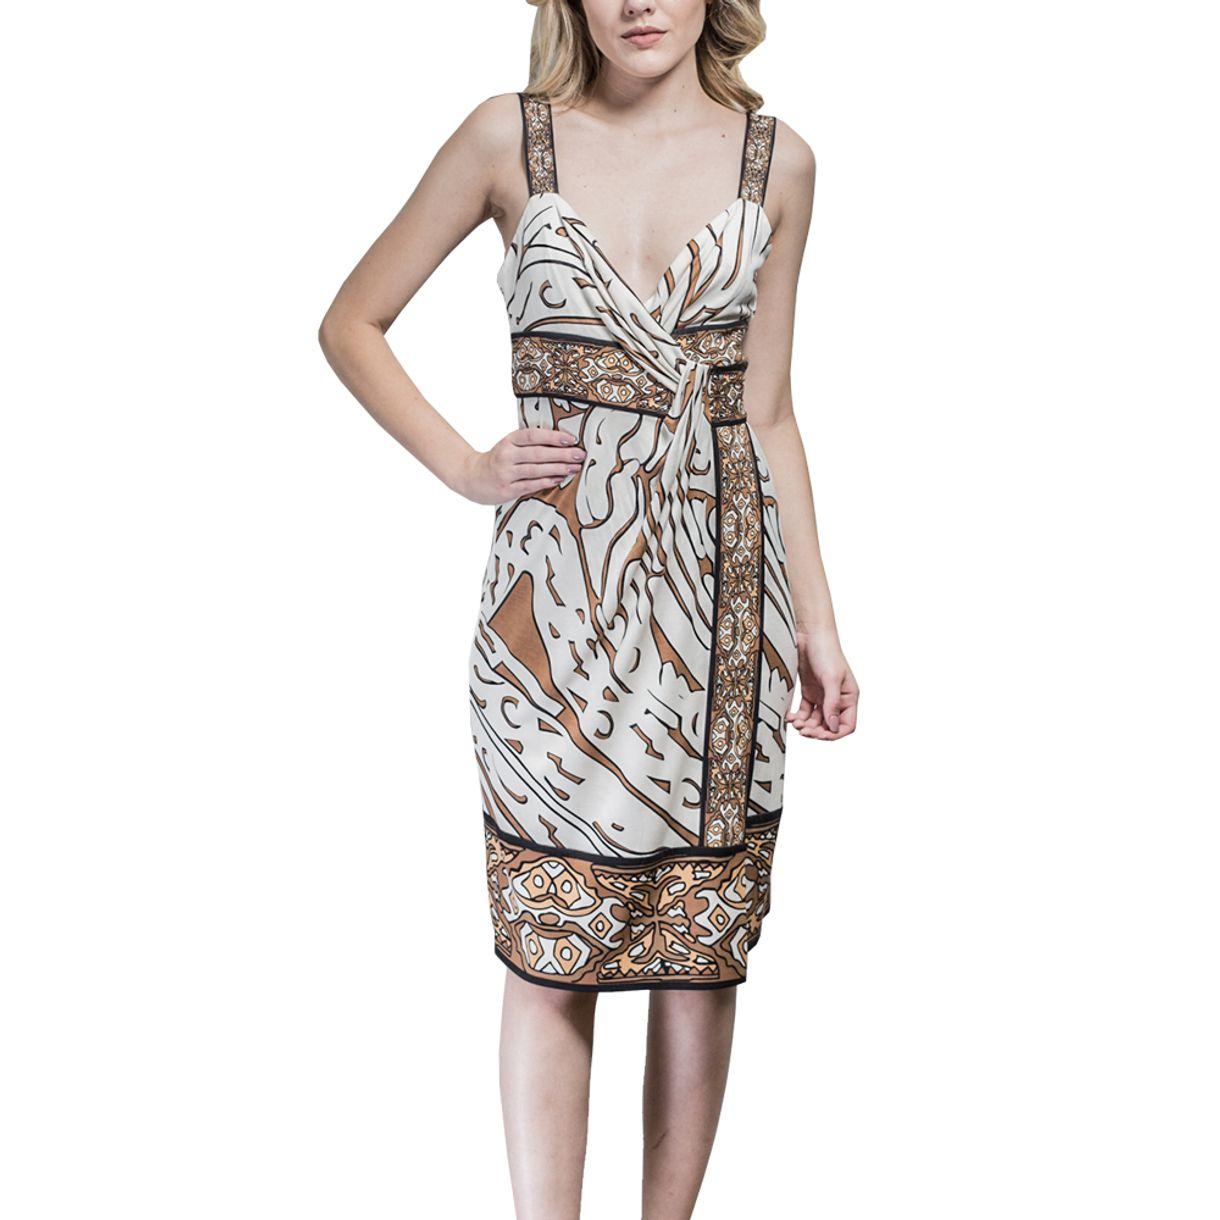 Vestido-Diane-Von-Furstenberg-Estampado-Wrap